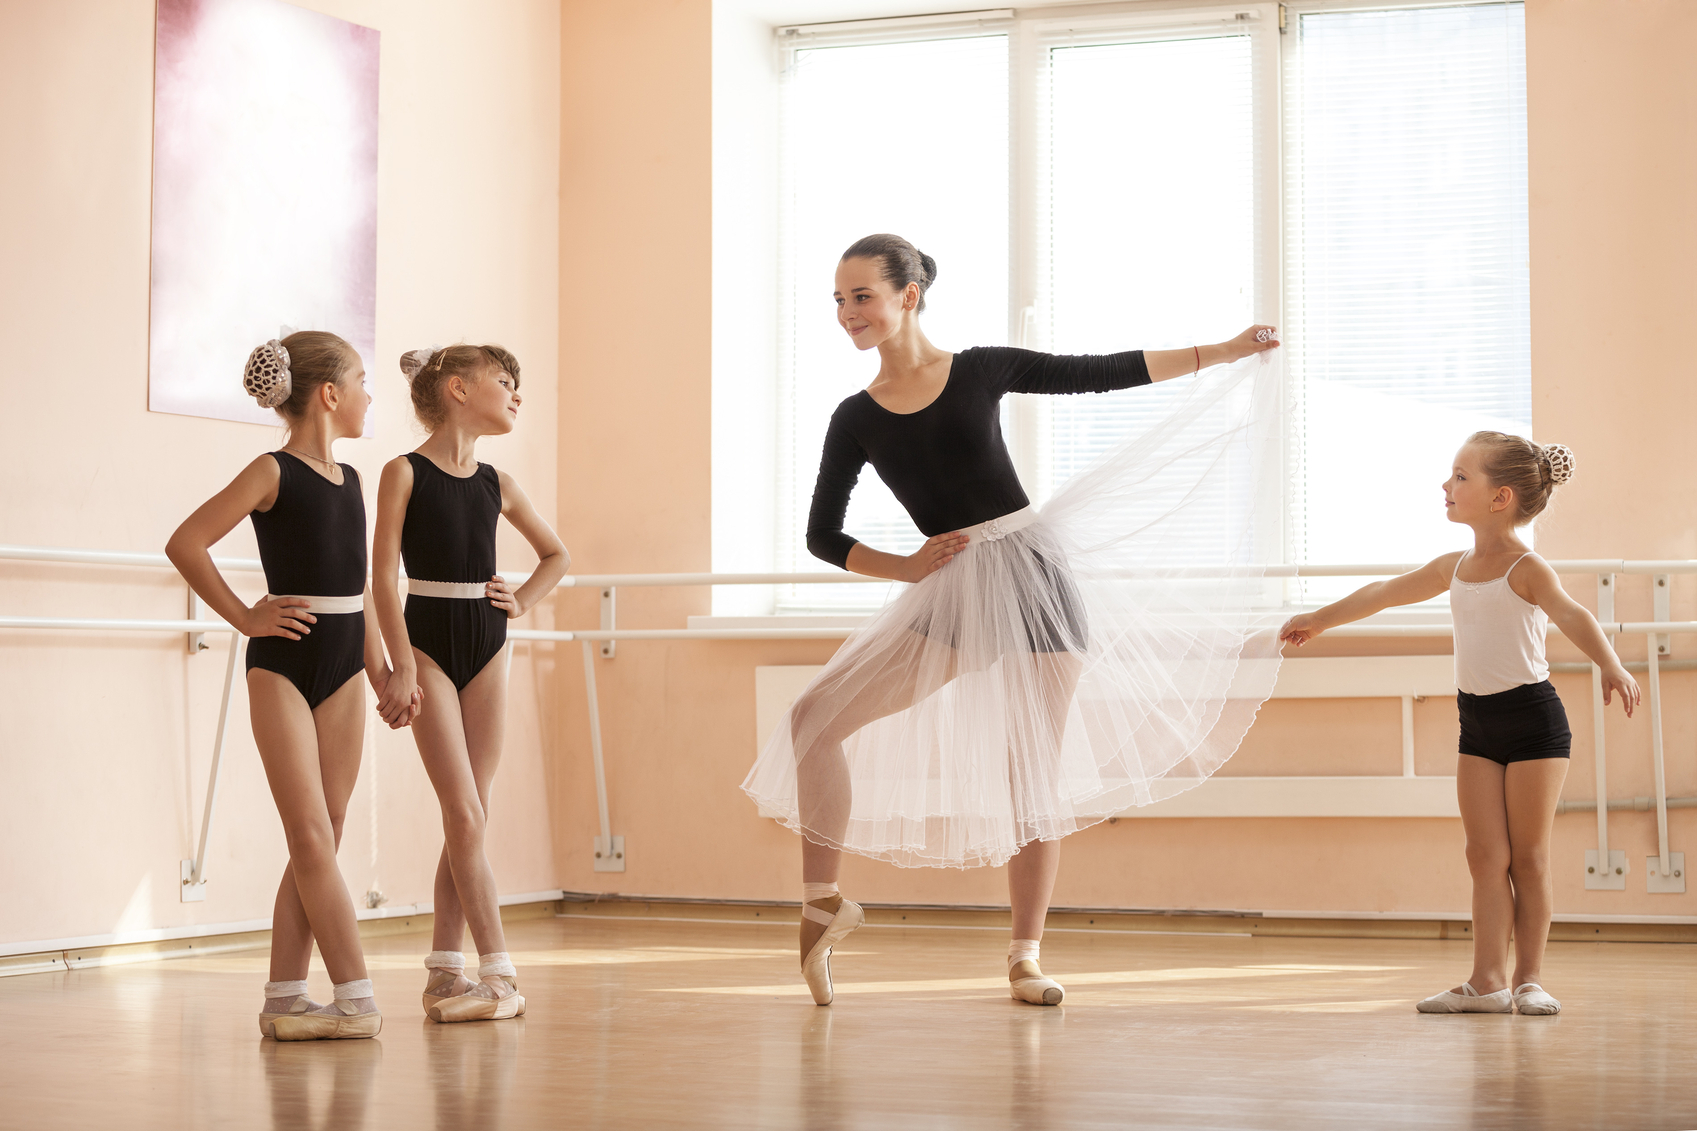 Clases De Baile 5 Beneficios Psicológicos